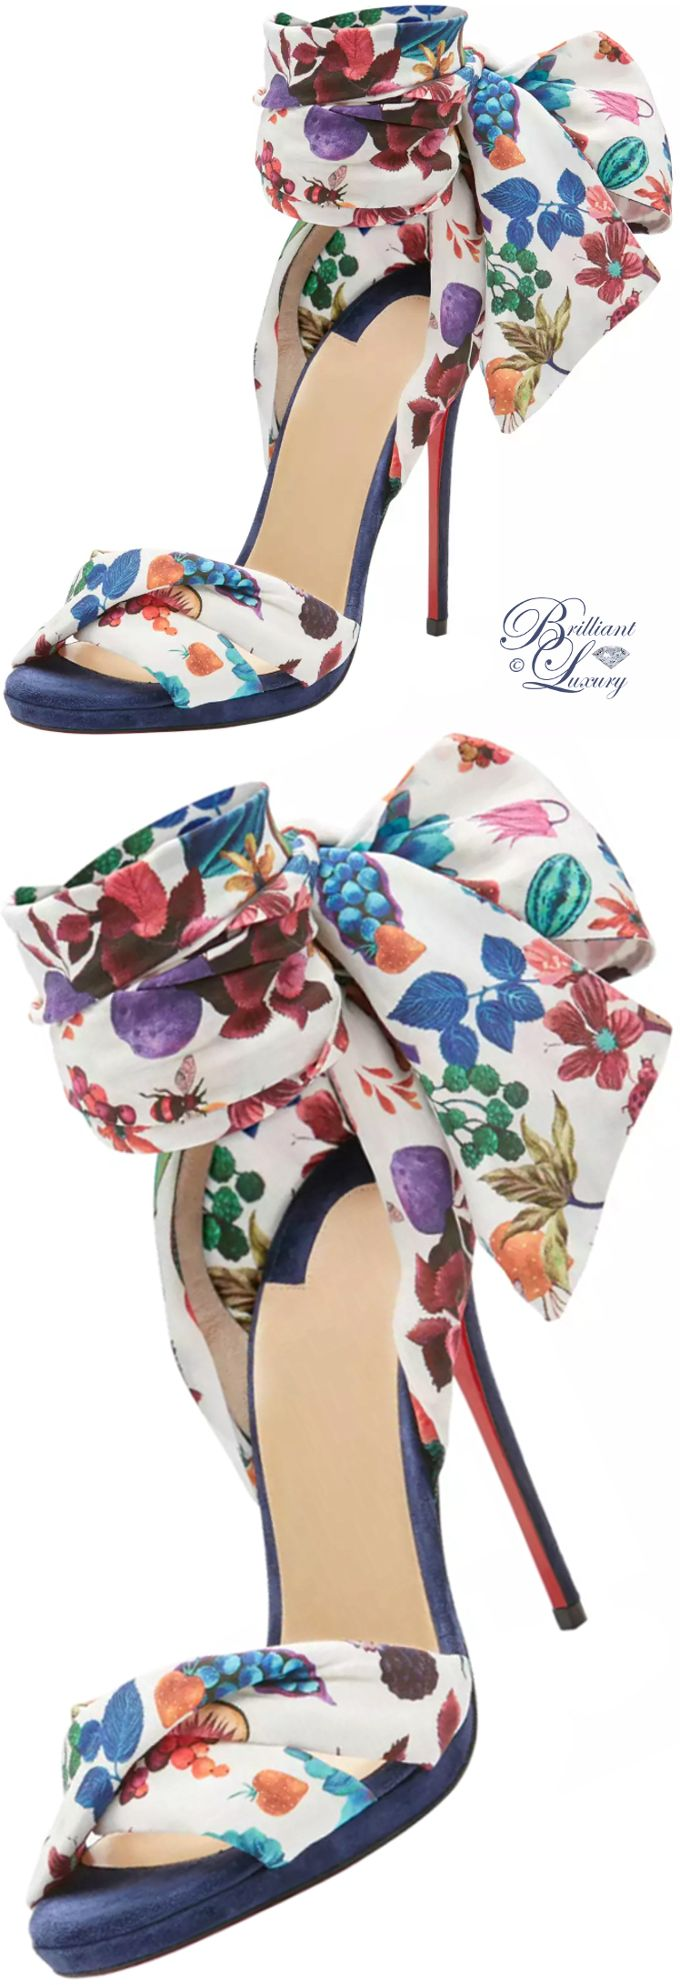 Brilliant Luxury ♦ Christian Louboutin Tres Frais Patterned Red Sole Sandal